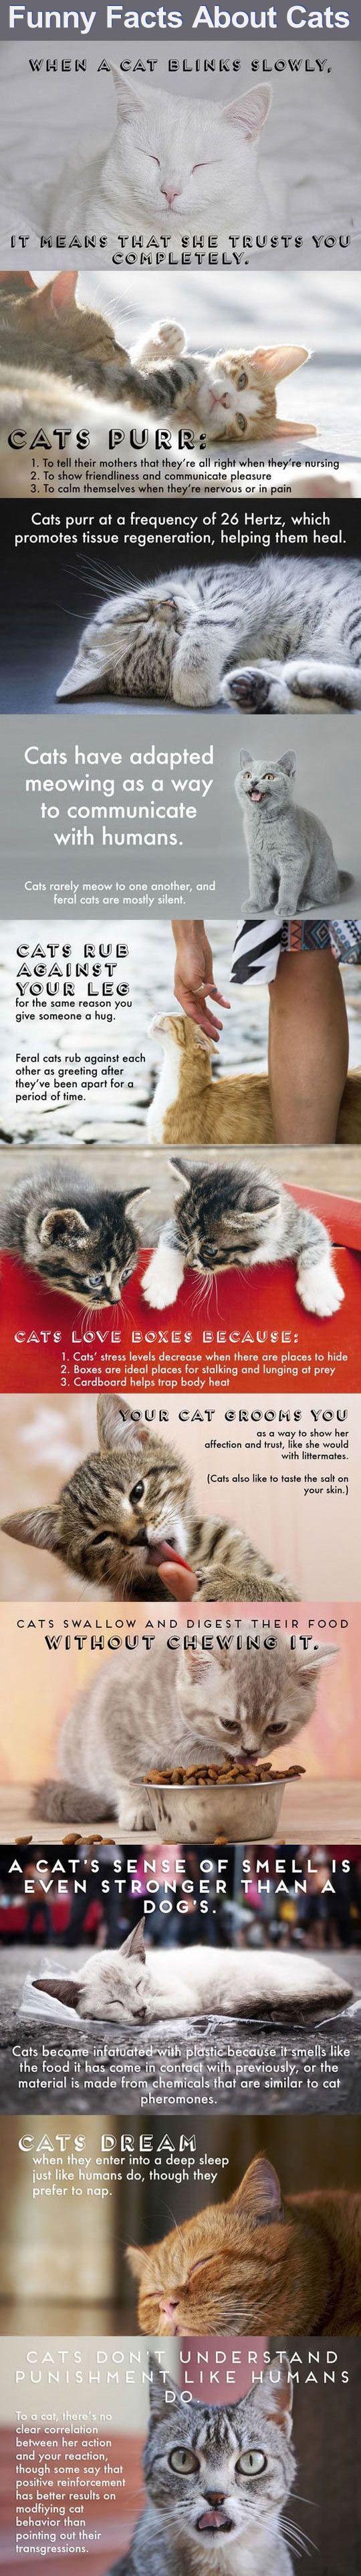 Funny Cat Facts Cute Animals Cat Cats Adorable Animal Kittens Pets Kitten Facts Funny Animals Funny Cats Animals Funny Cats Cat Facts Crazy Cats